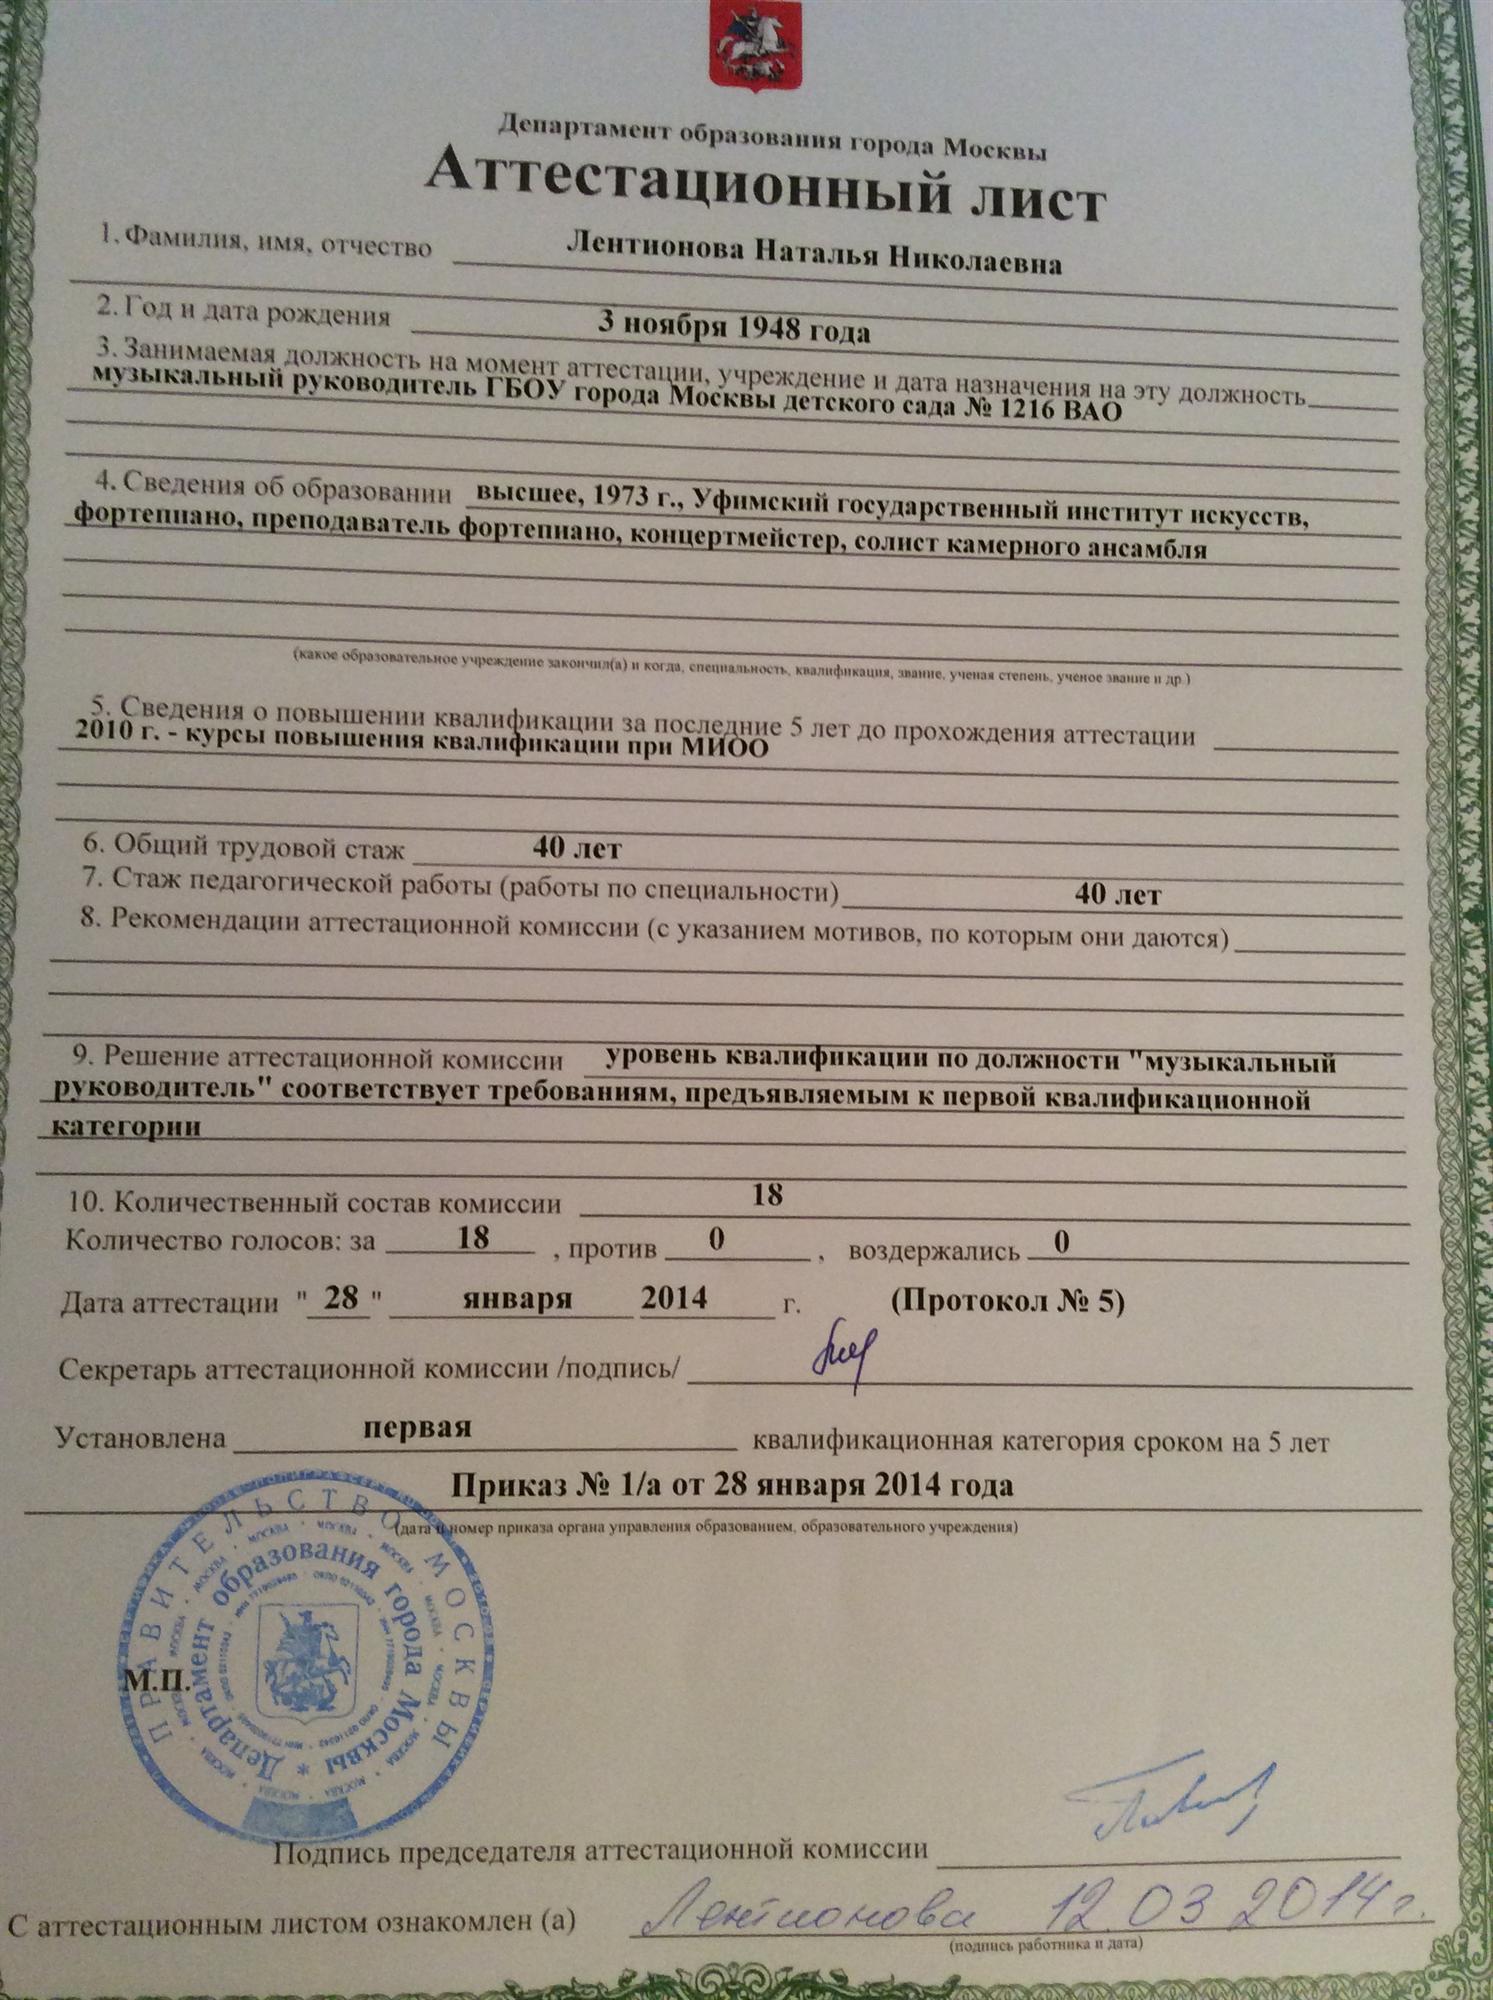 аттестационный лист врача на категорию бланк 2015